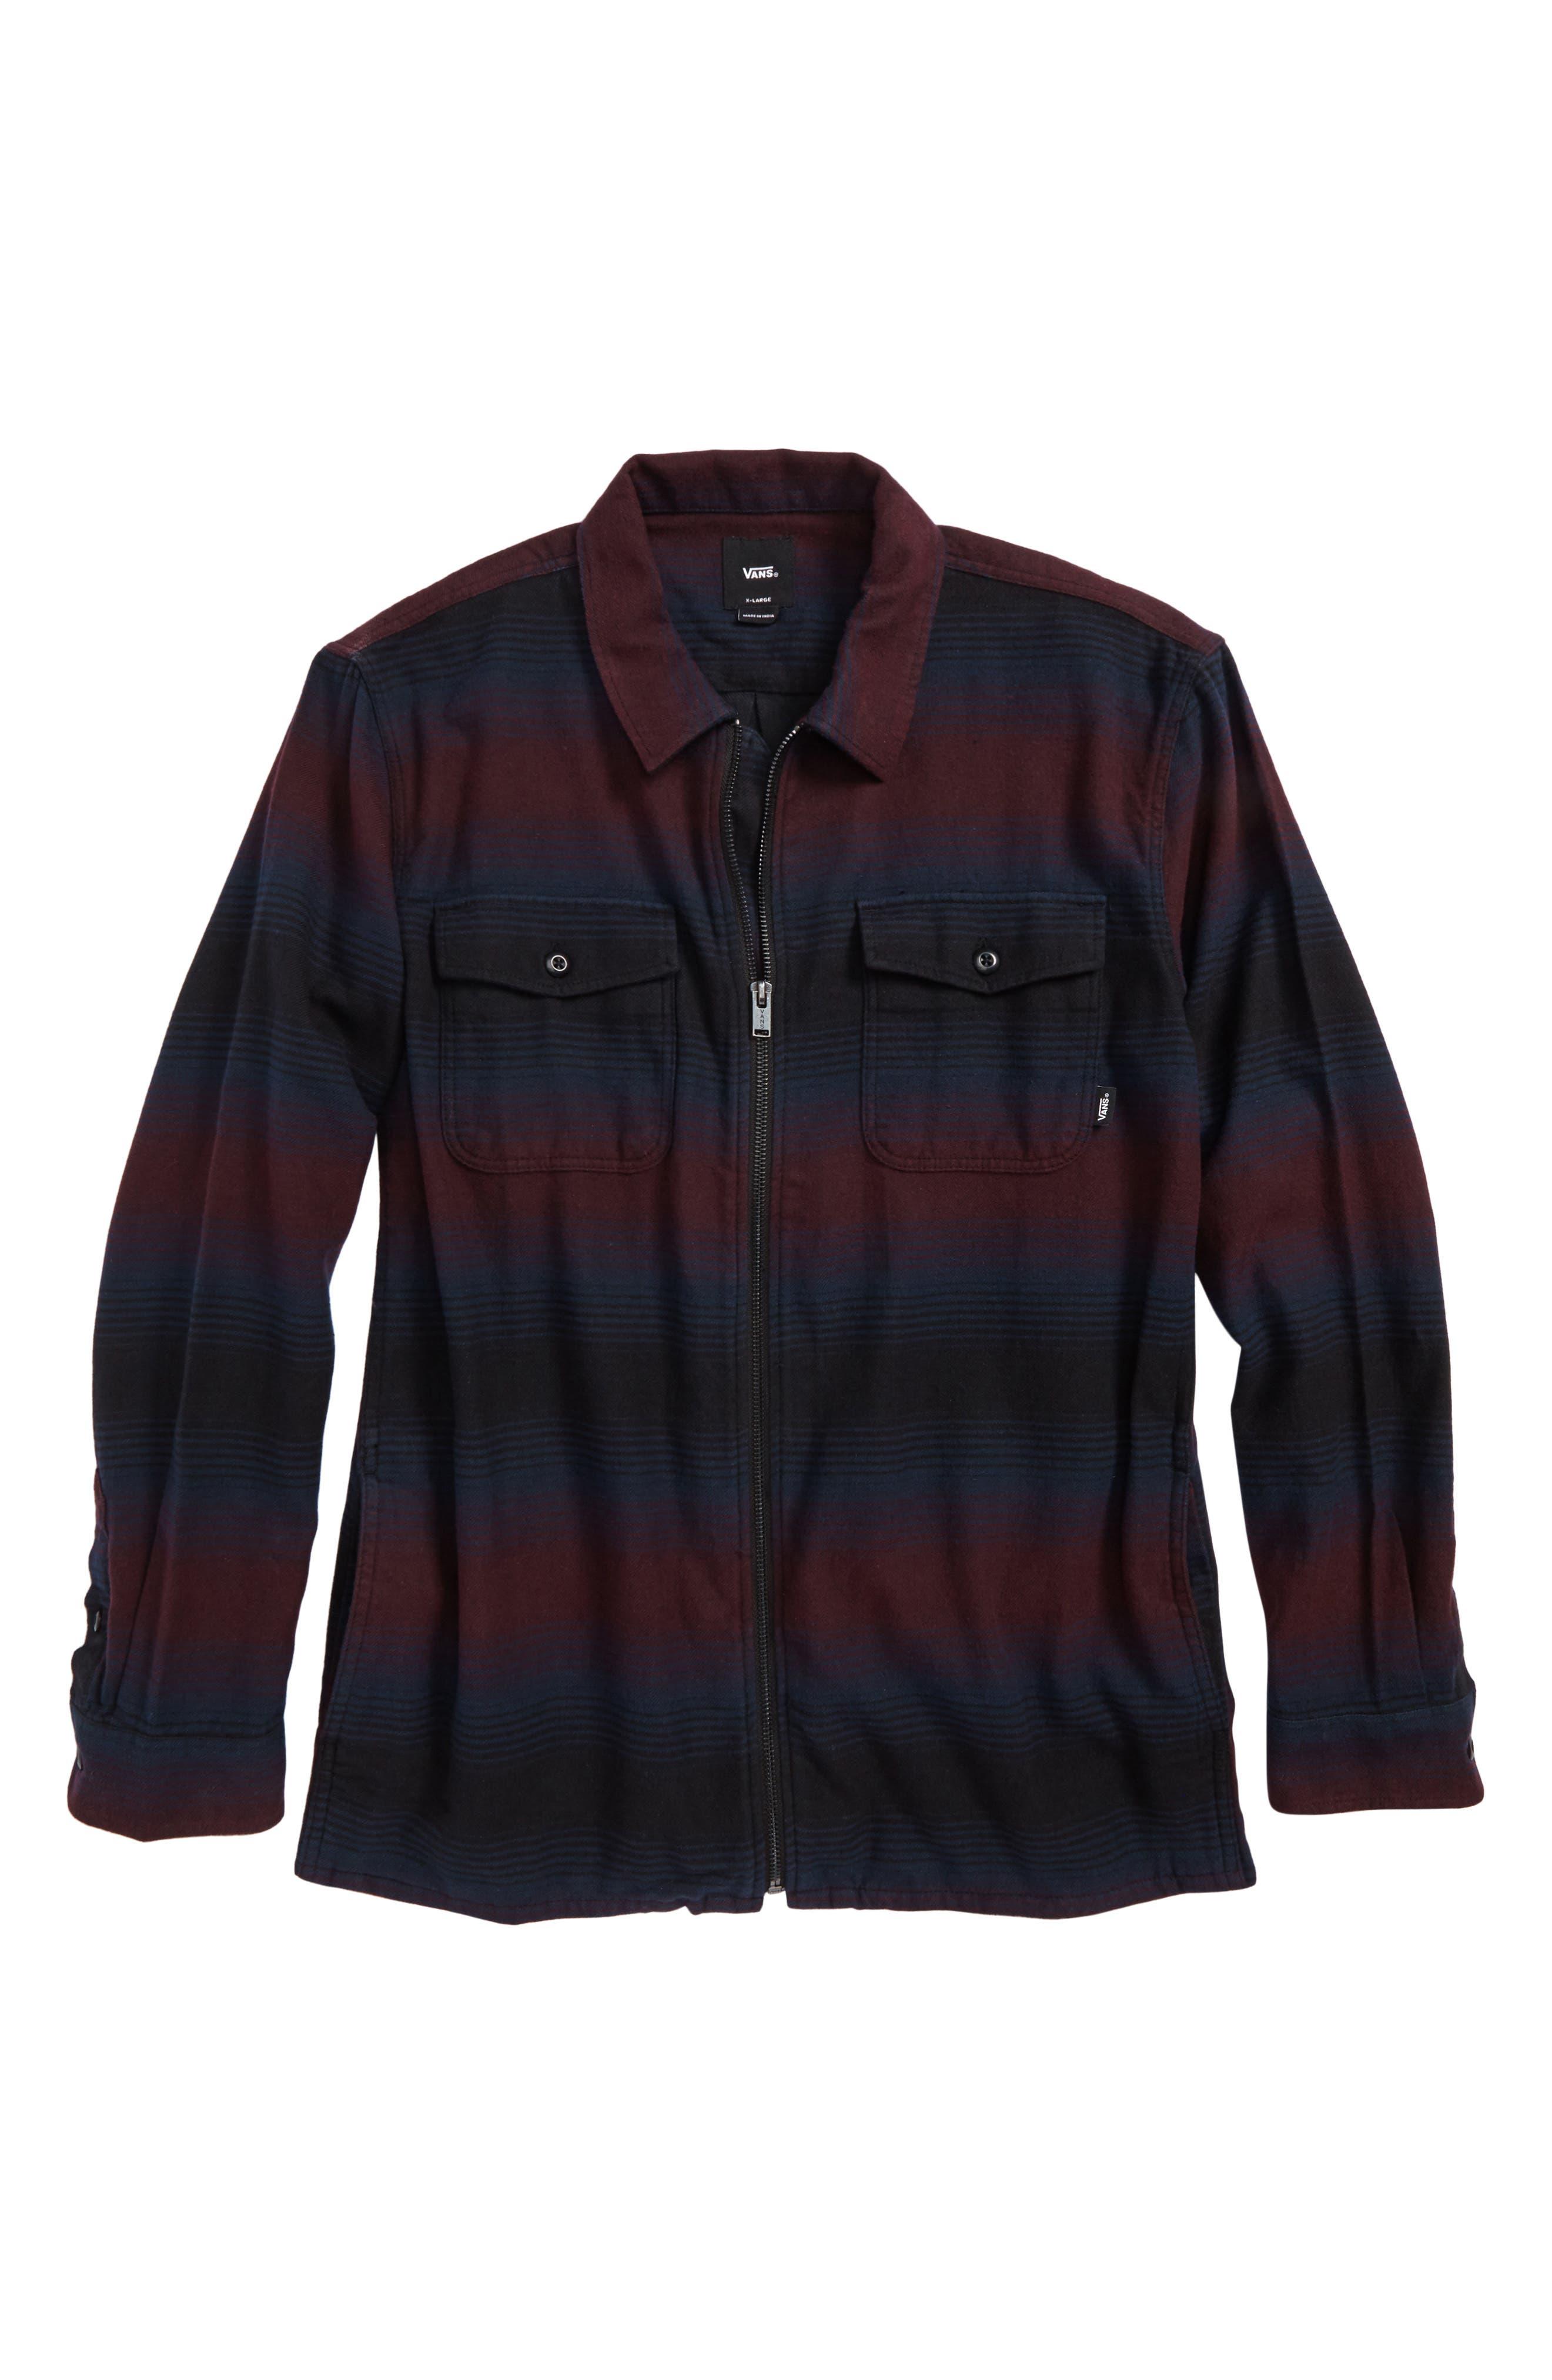 Brewster Zip Front Flannel Shirt,                         Main,                         color, Port Royale/ Stripe